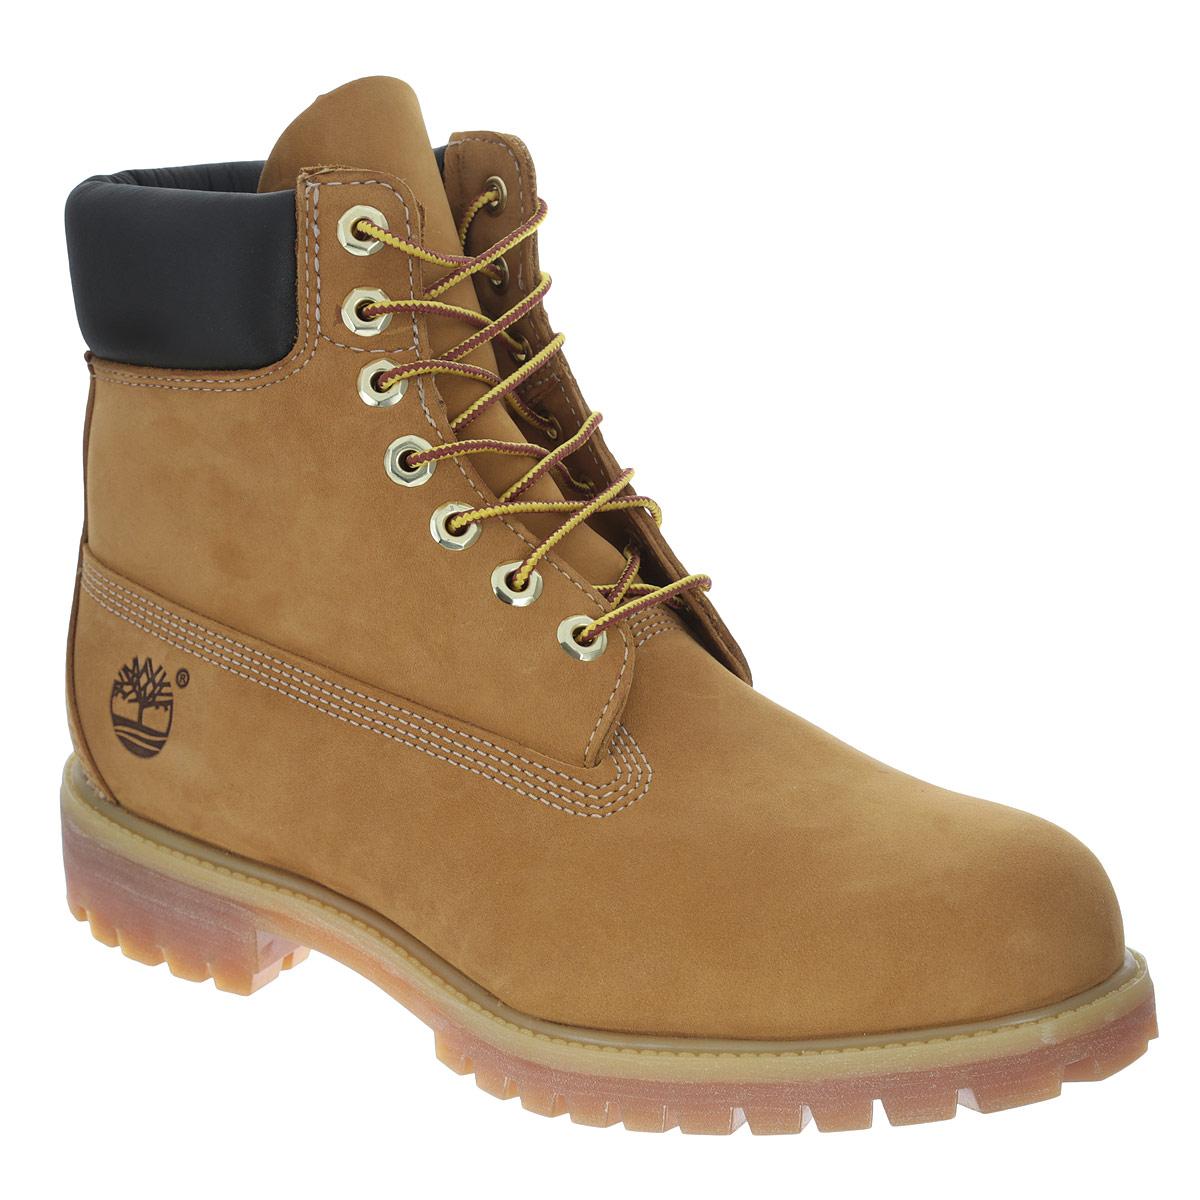 ������� ������� 6-inch Premium Boot. TBL10061W - TimberlandTBL10061W������� ������� ������� 6-inch Premium Boot �� Timberland ������������ ��� ����� �������� � ������� �������! ������ ����������� �� ������������ ������ � ��������� ������������ �����������, ������ ������, ������������ ��������� �� �������, ����� - �������� ��������� ������. ������� ������ � �������� ������������ ������� ���������� ������� ����� ������� � ����, �������� �������������� �����������. ������� ������� EVA � ������������ �� ����������� ���� ������������ ������������ ������� ��� ��������. ������ � ������� � ����������� ����������� ��������� ��������� � ������ �������������. ������ ������� �� ������� ��� ������������!